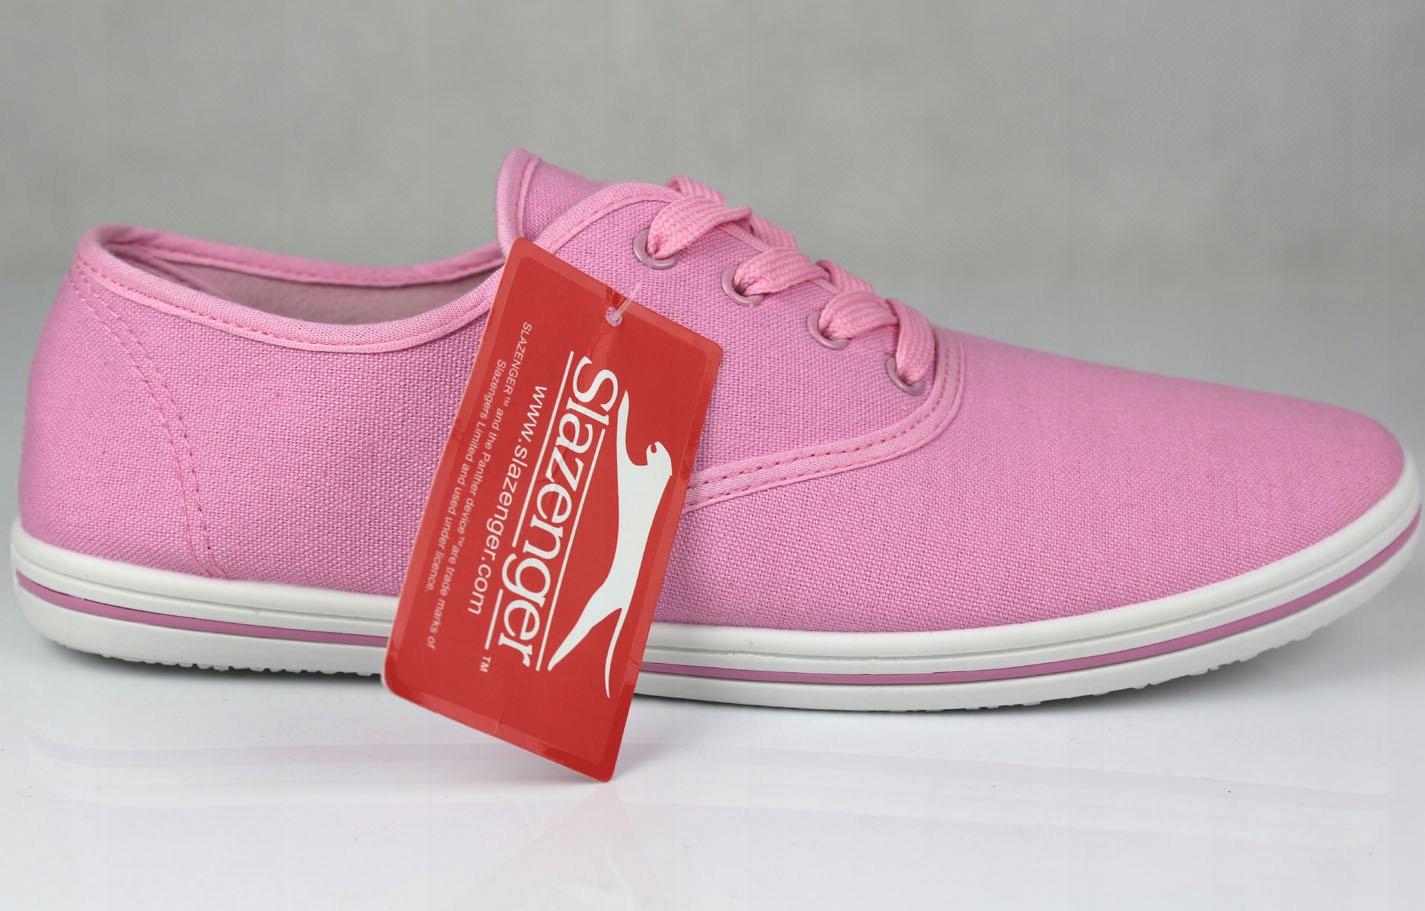 Tenisówki SLAZENGER buty trampki tu 39.5 - 25.5 cm